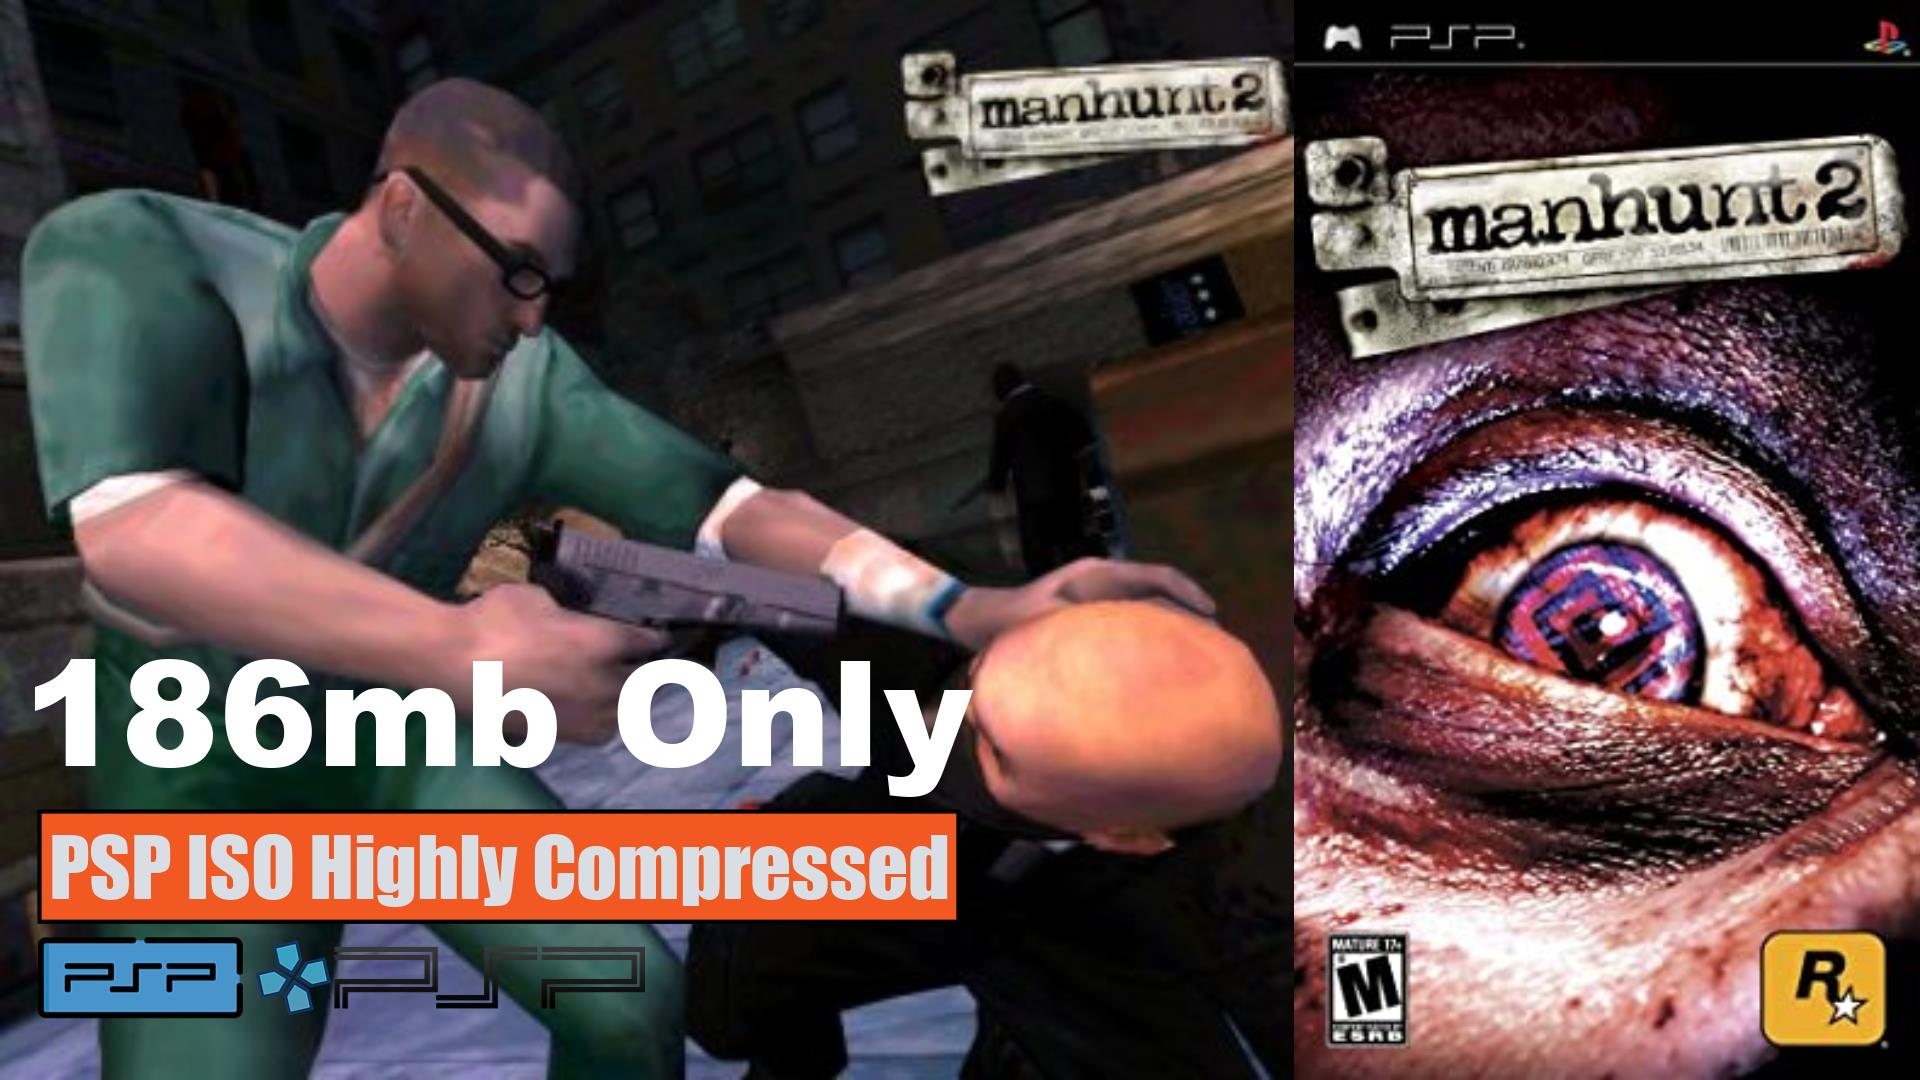 Manhunt 2 PSP PSP ISO Highly Compressed